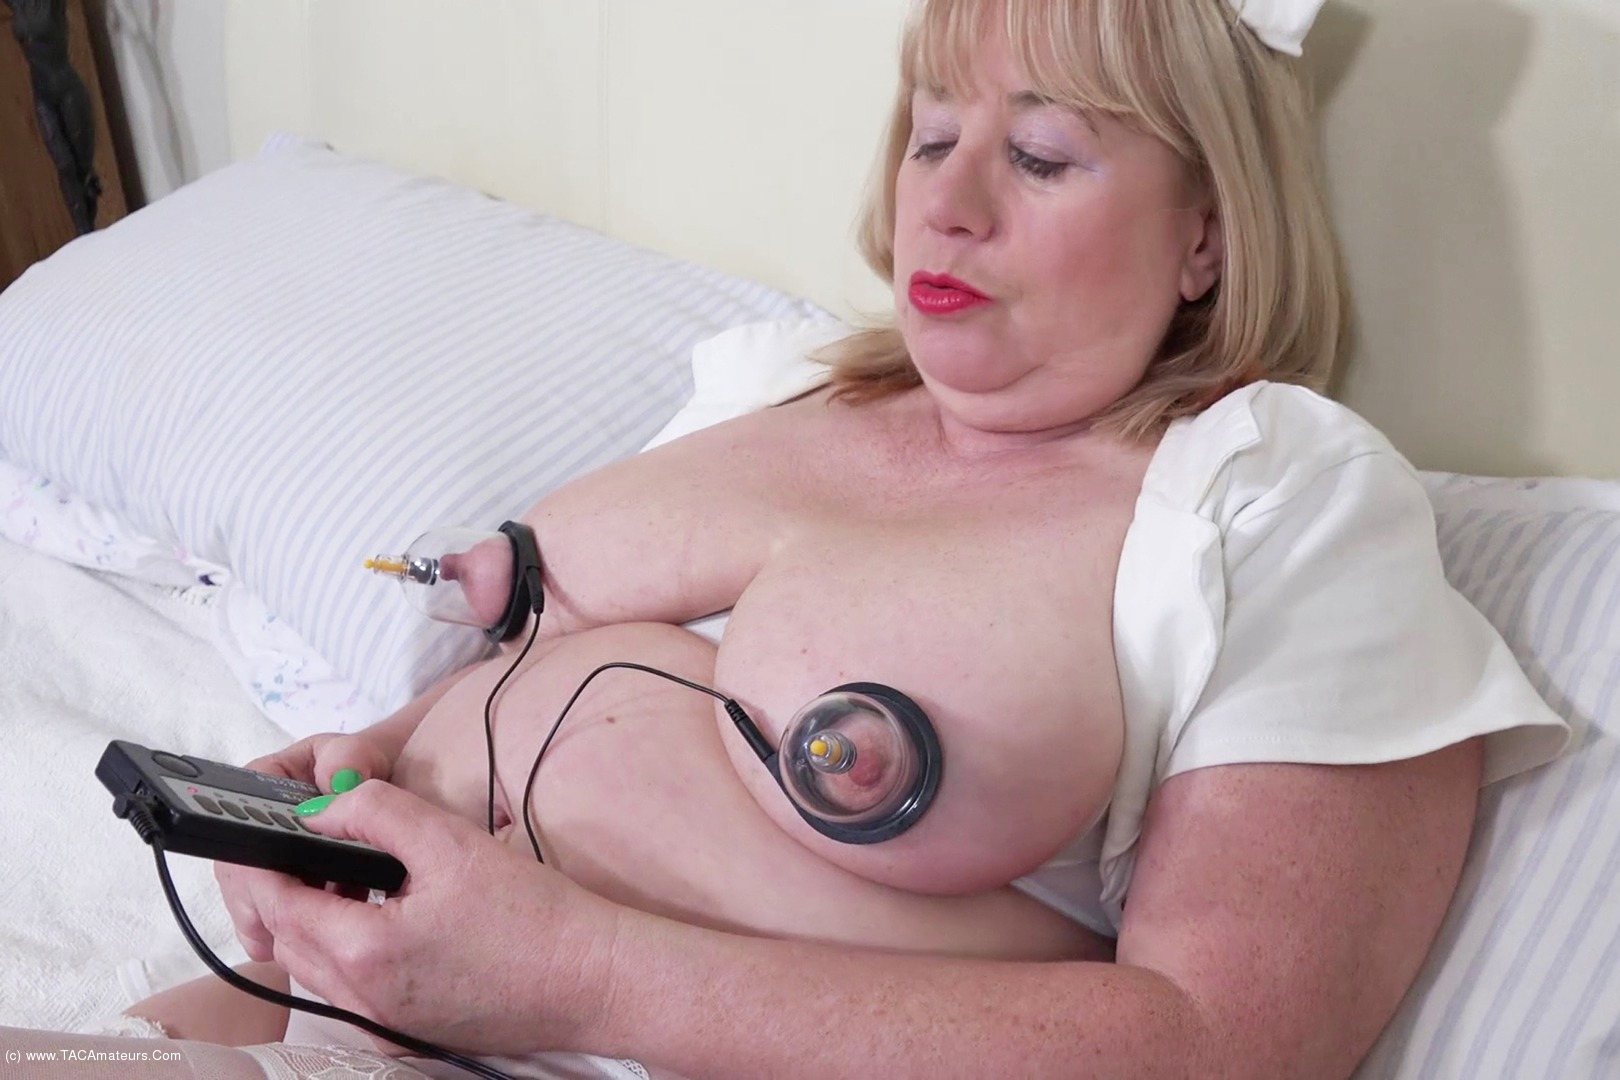 SpeedyBee - Electro Stimulation Pt1 scene 2